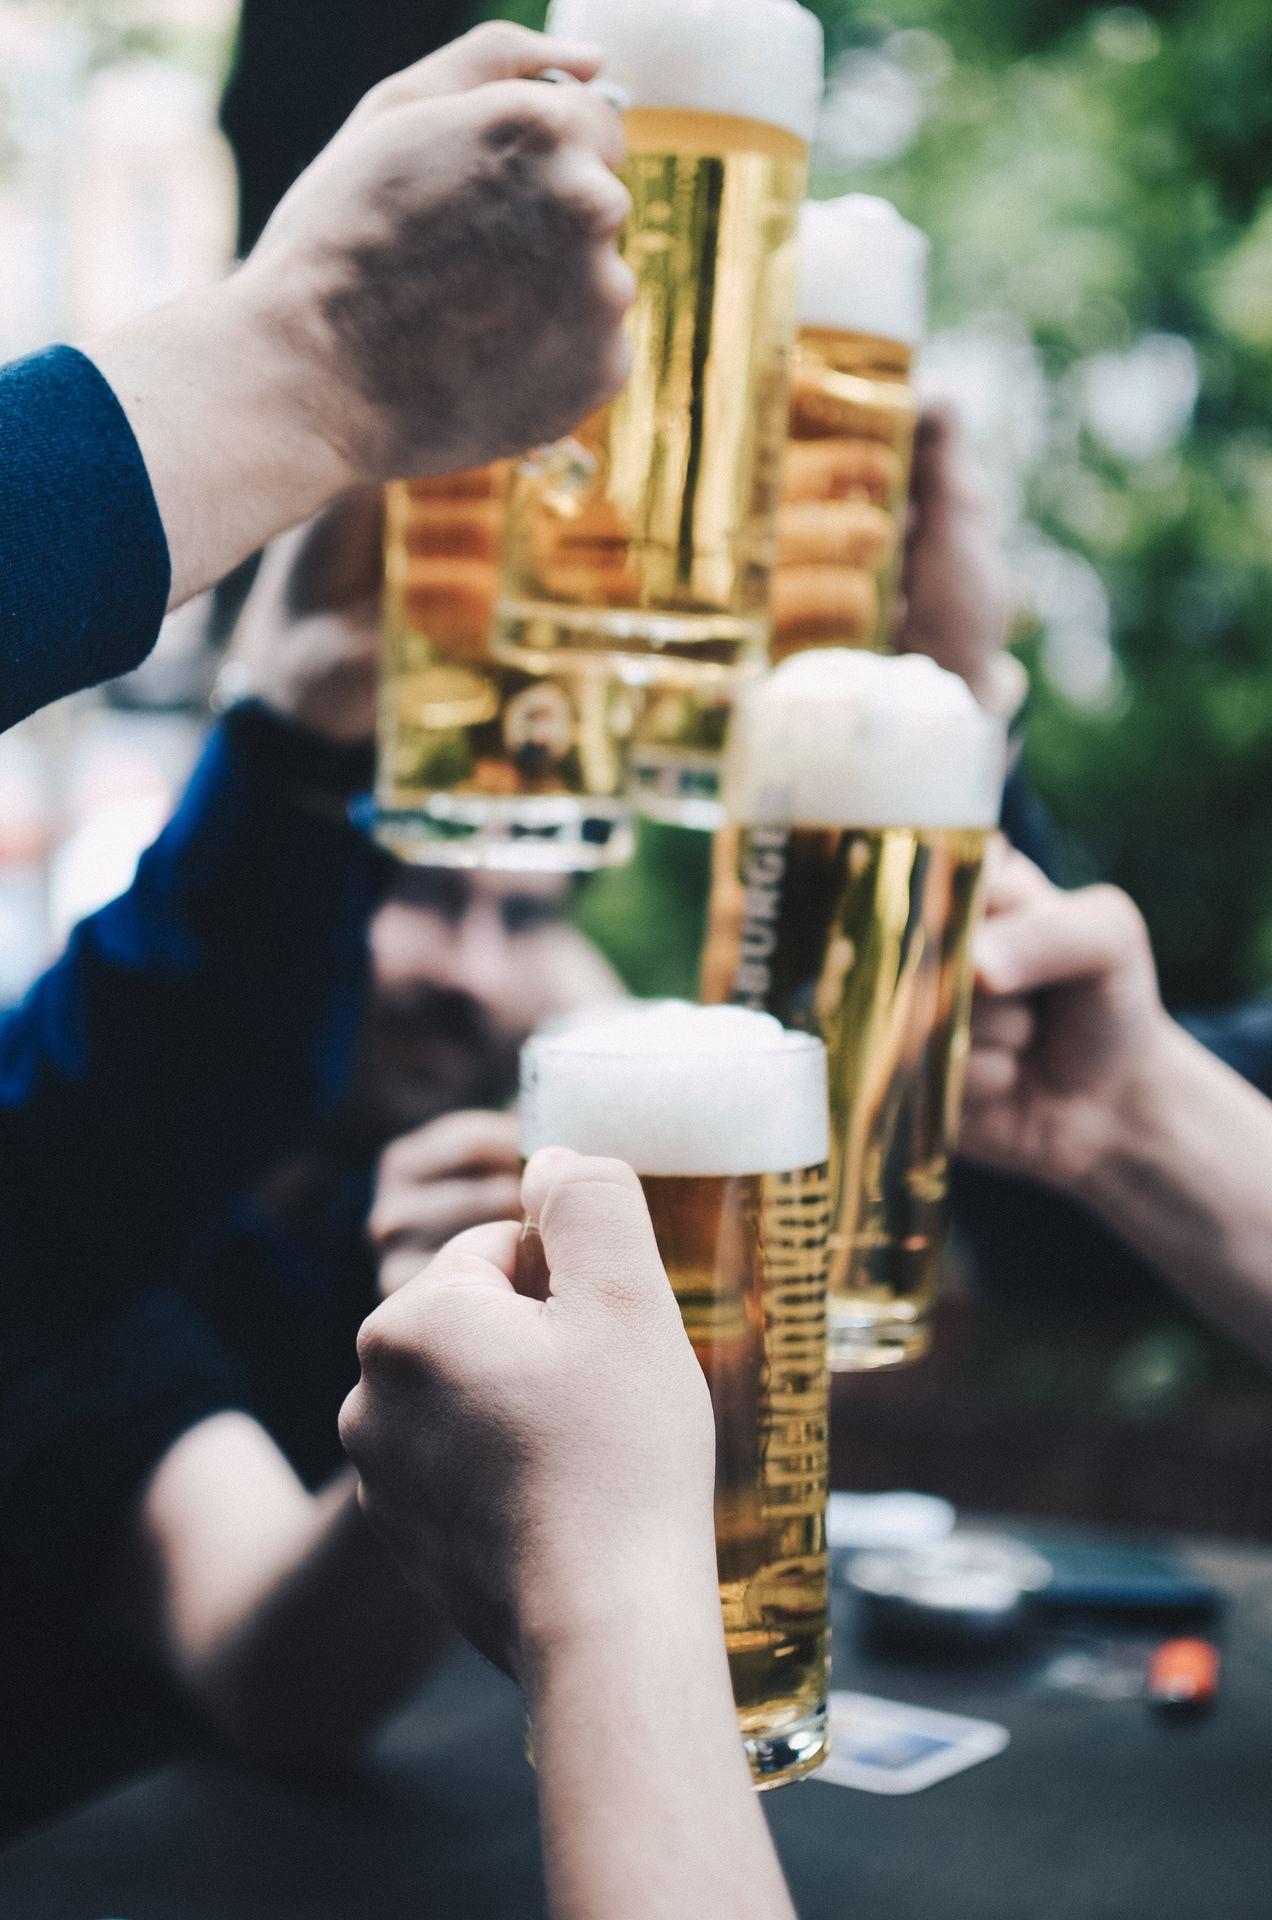 Hav plads til ølbrygning